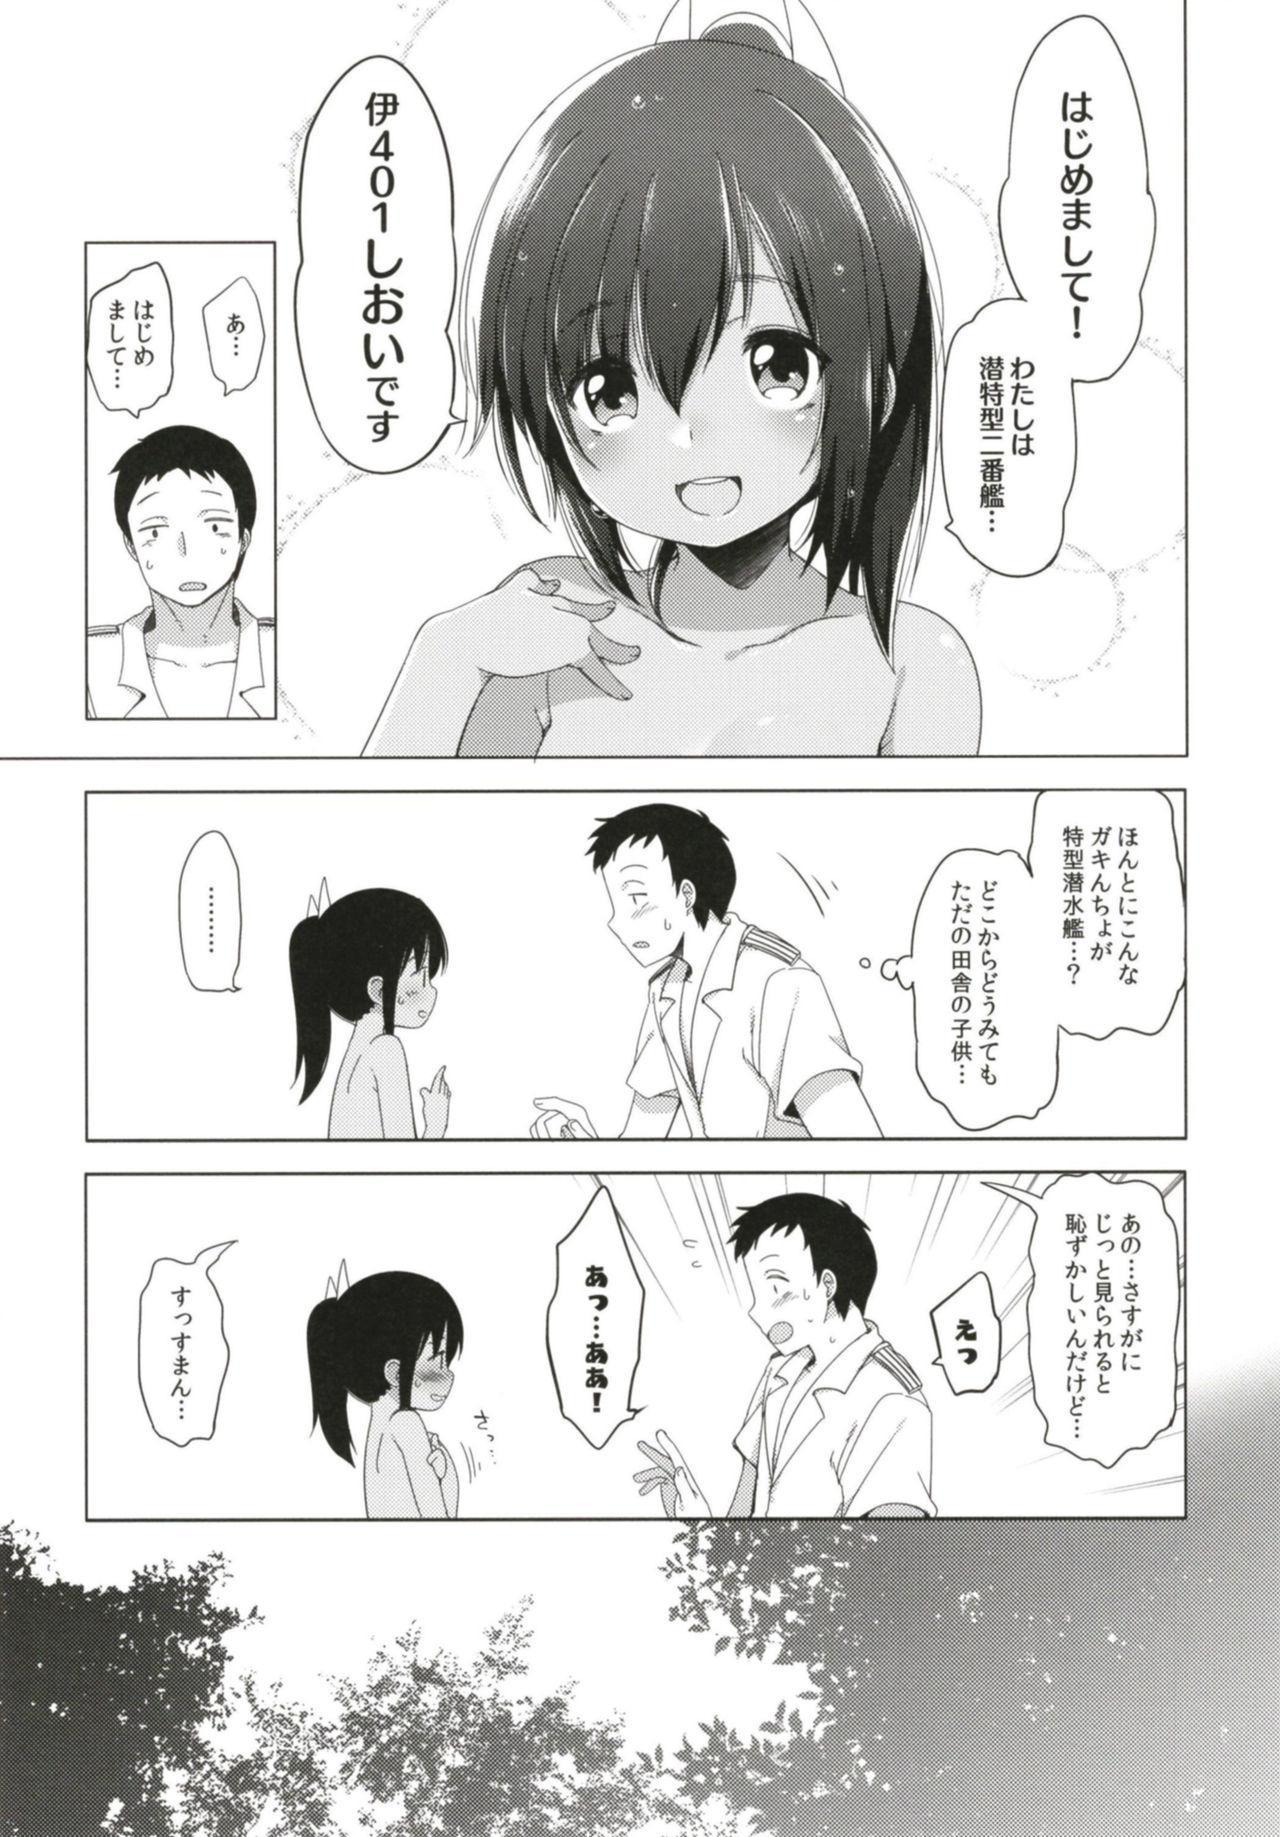 [French letter (Fujisaki Hikari)] Hitonatsu no Ayamachi -I-401 Soushuuhen- (Kantai Collection -KanColle-) [Digital] 8